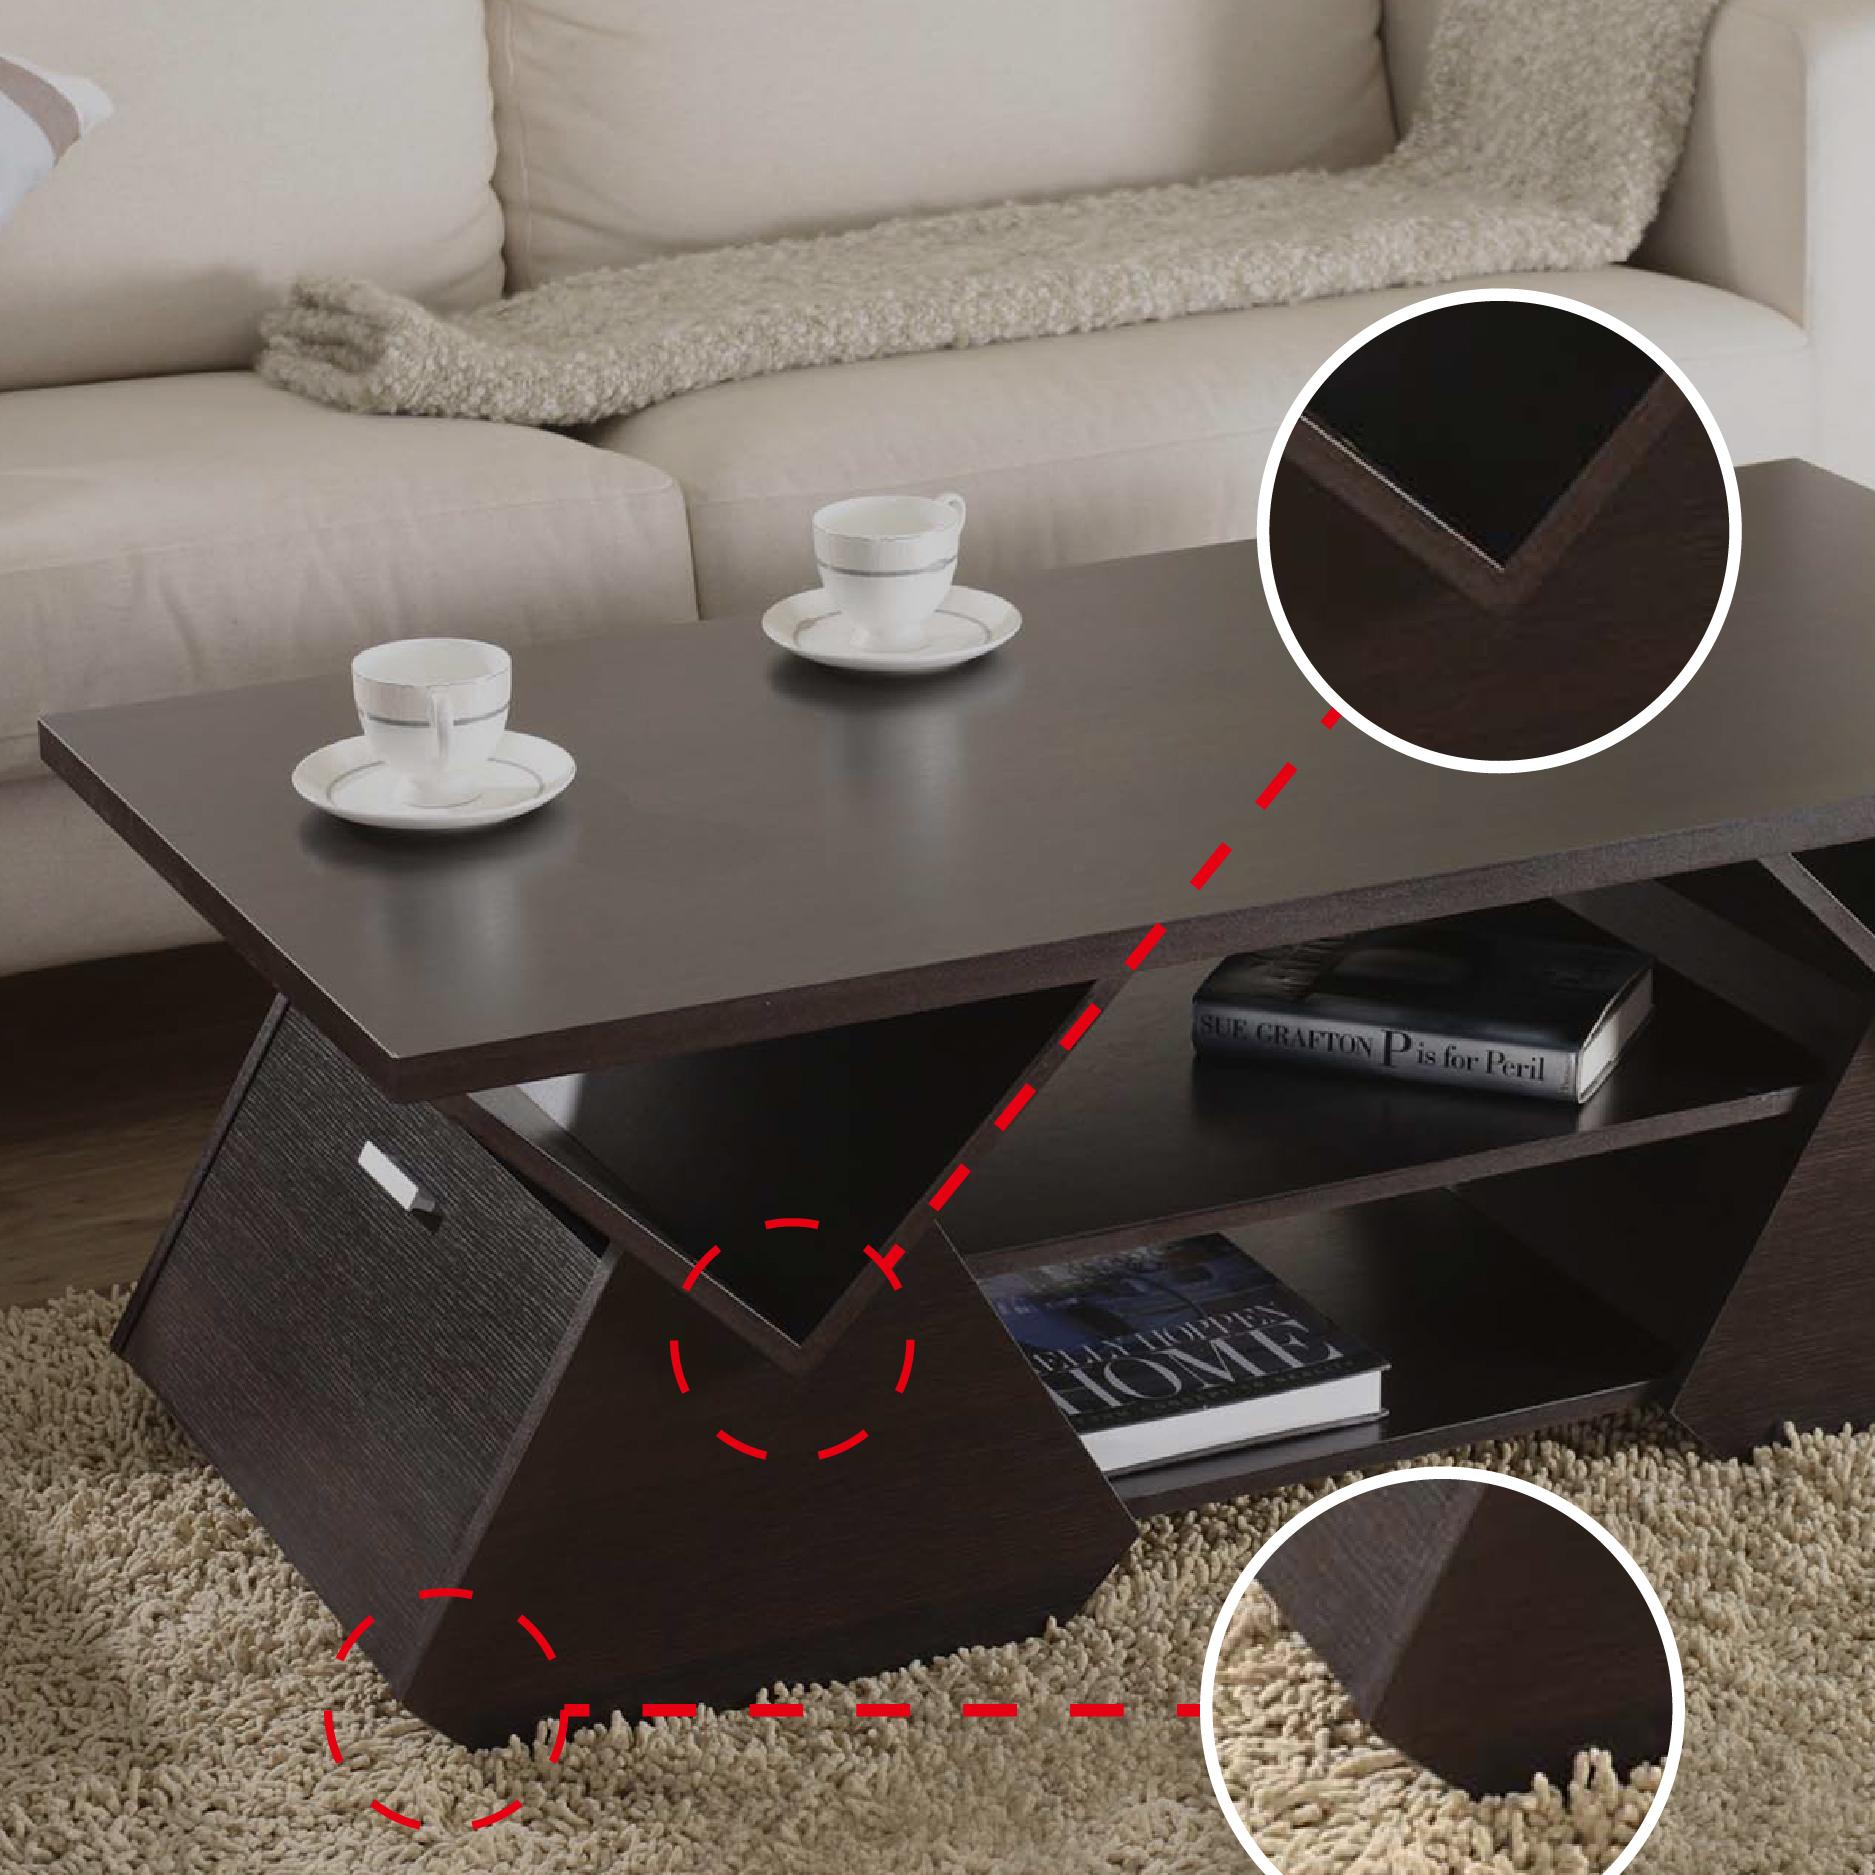 table basse g om trique pyramidale fabricants de meubles de maison slicethinner. Black Bedroom Furniture Sets. Home Design Ideas